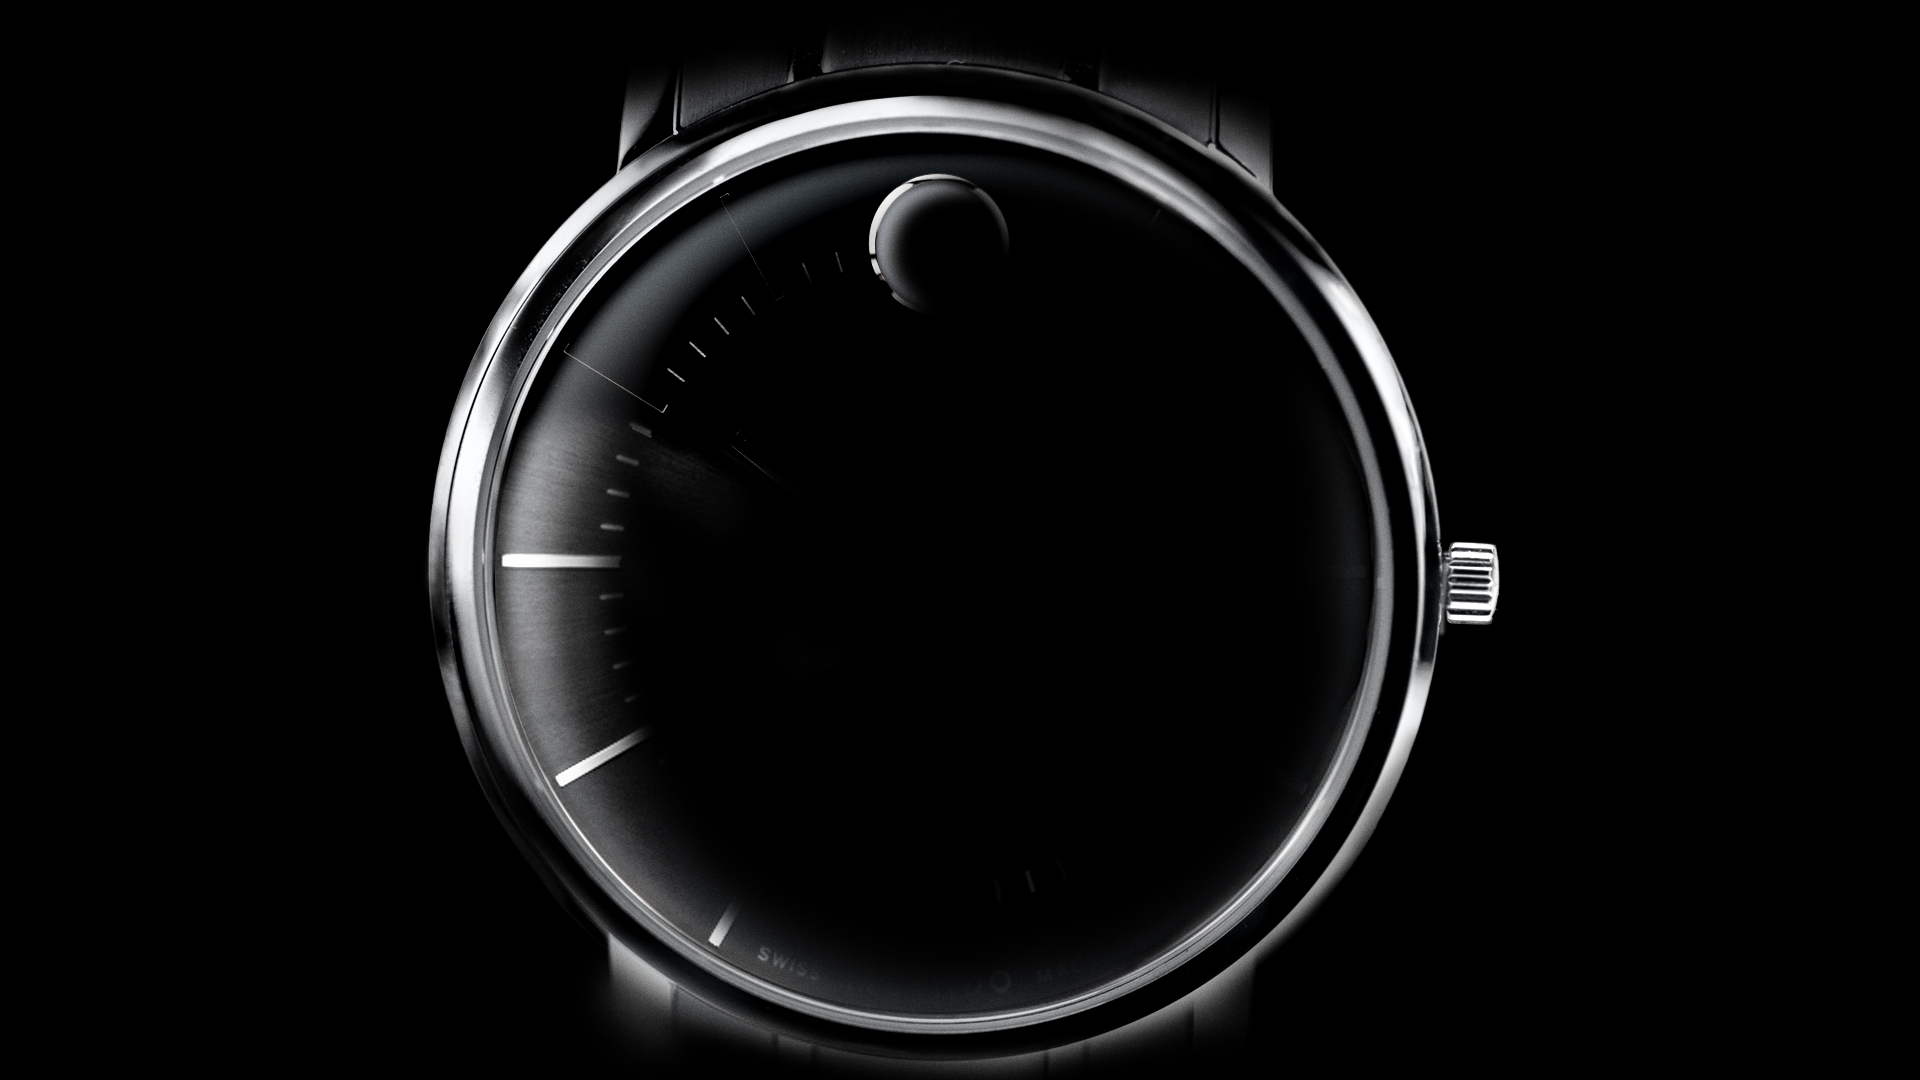 moon_phases_004.jpg